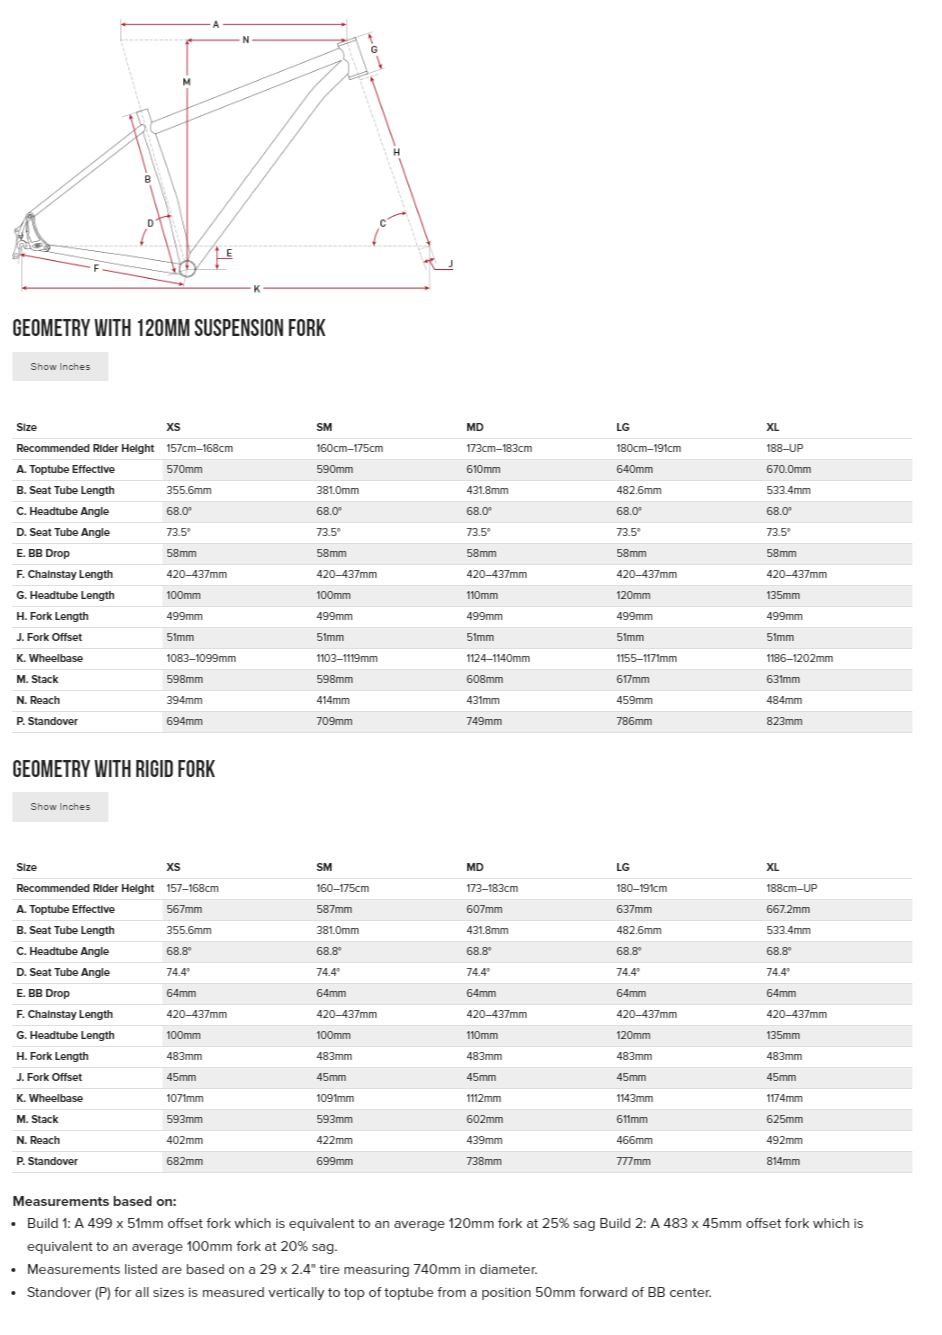 Salsa Timberjack geometry chart